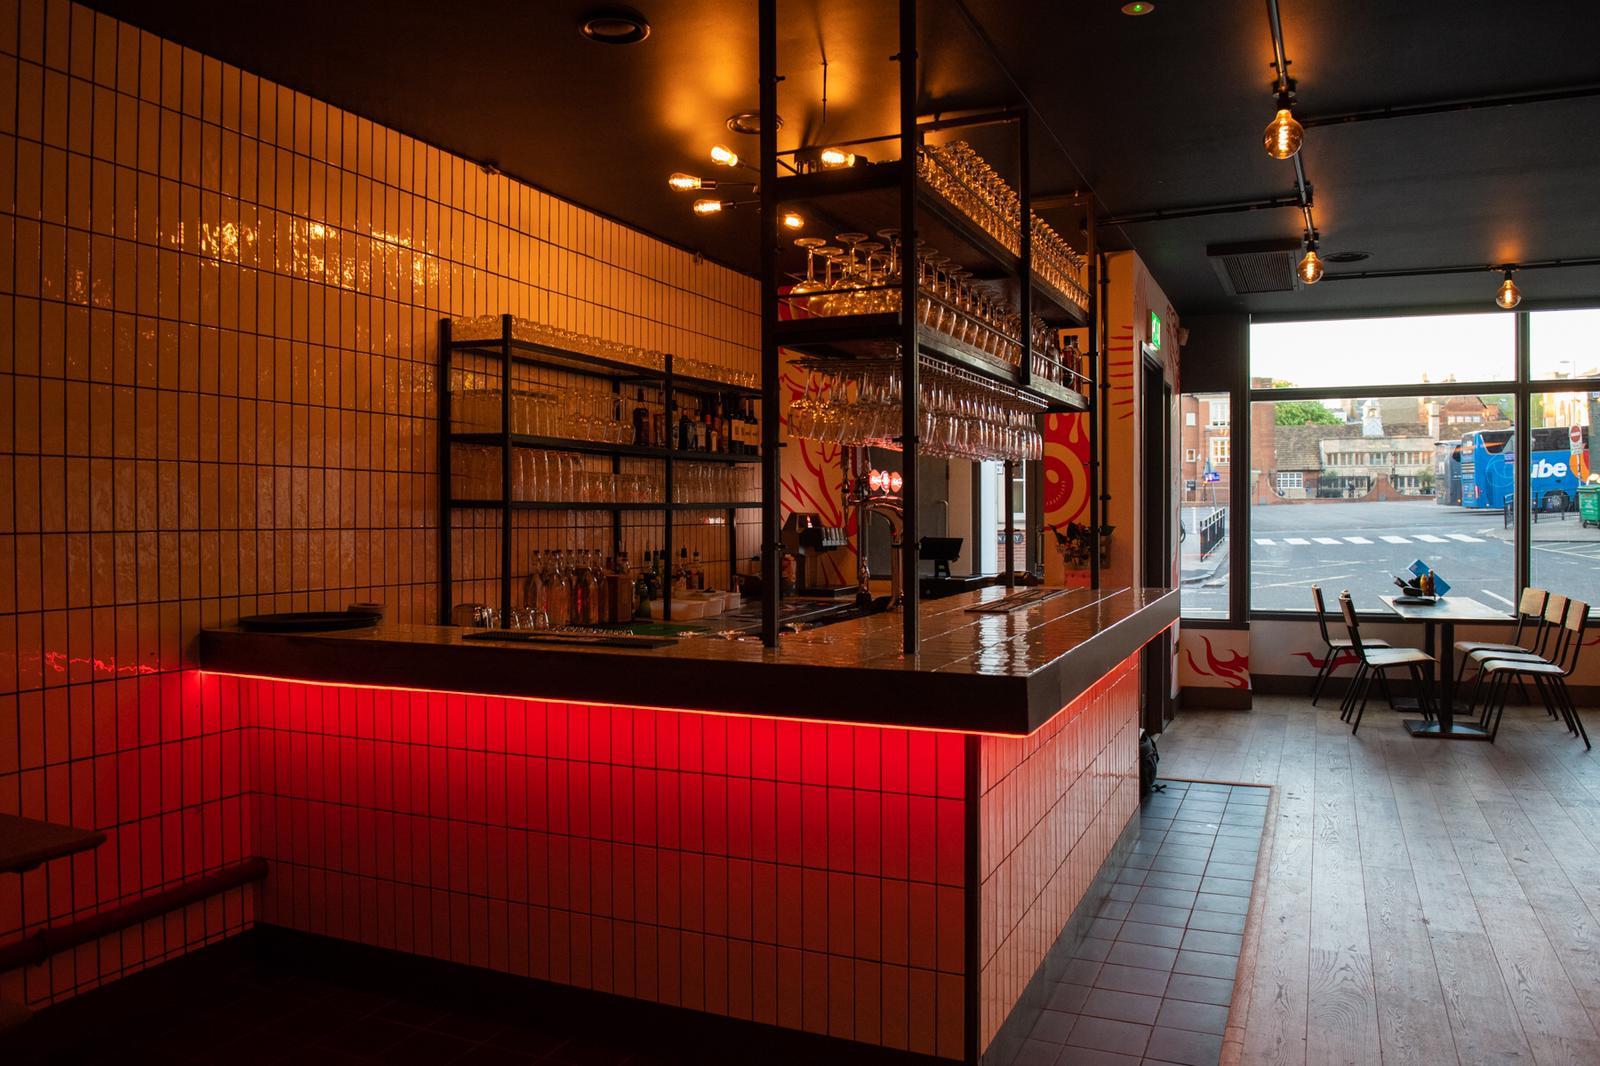 Glut, Oxford - Burger Restaurant - Gallery Image 11